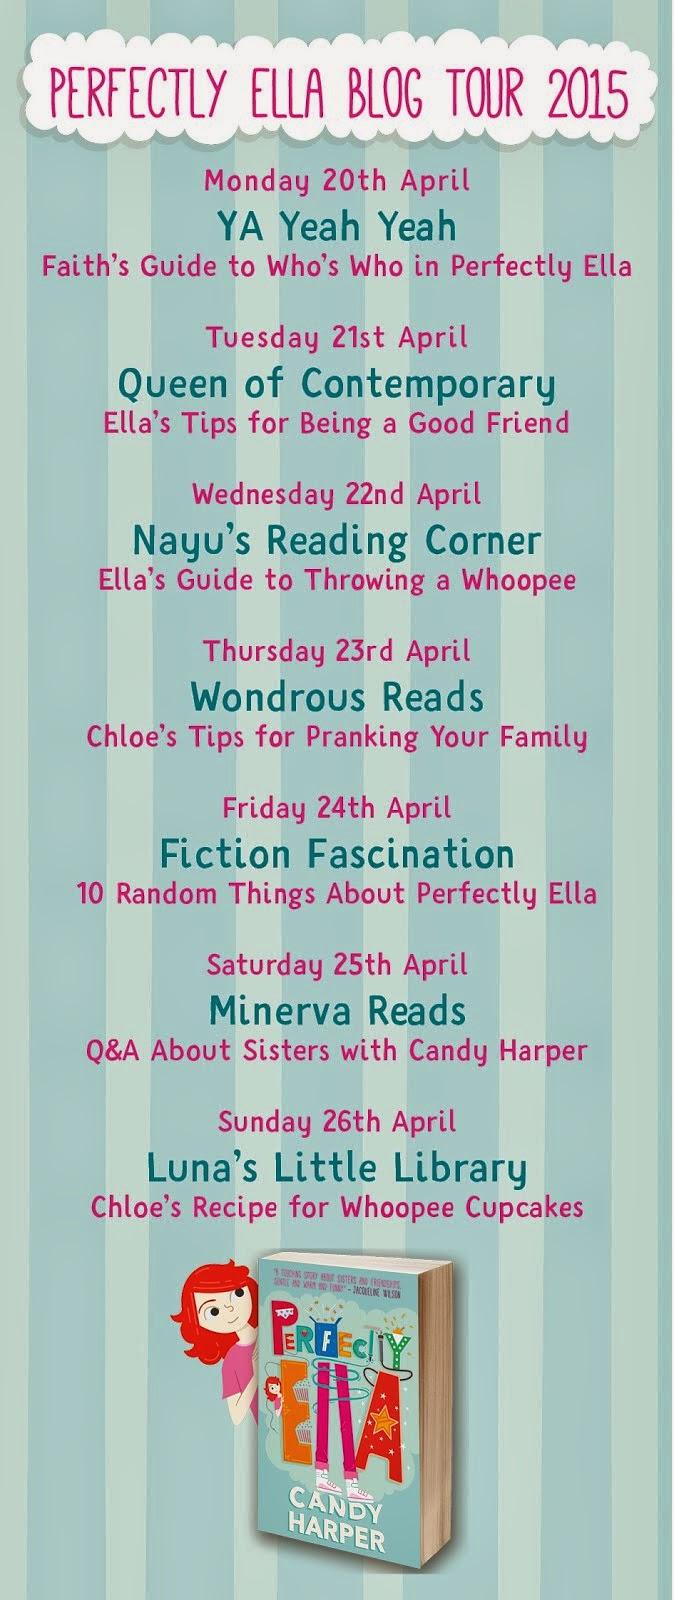 Perfectly Ella Blog Tour